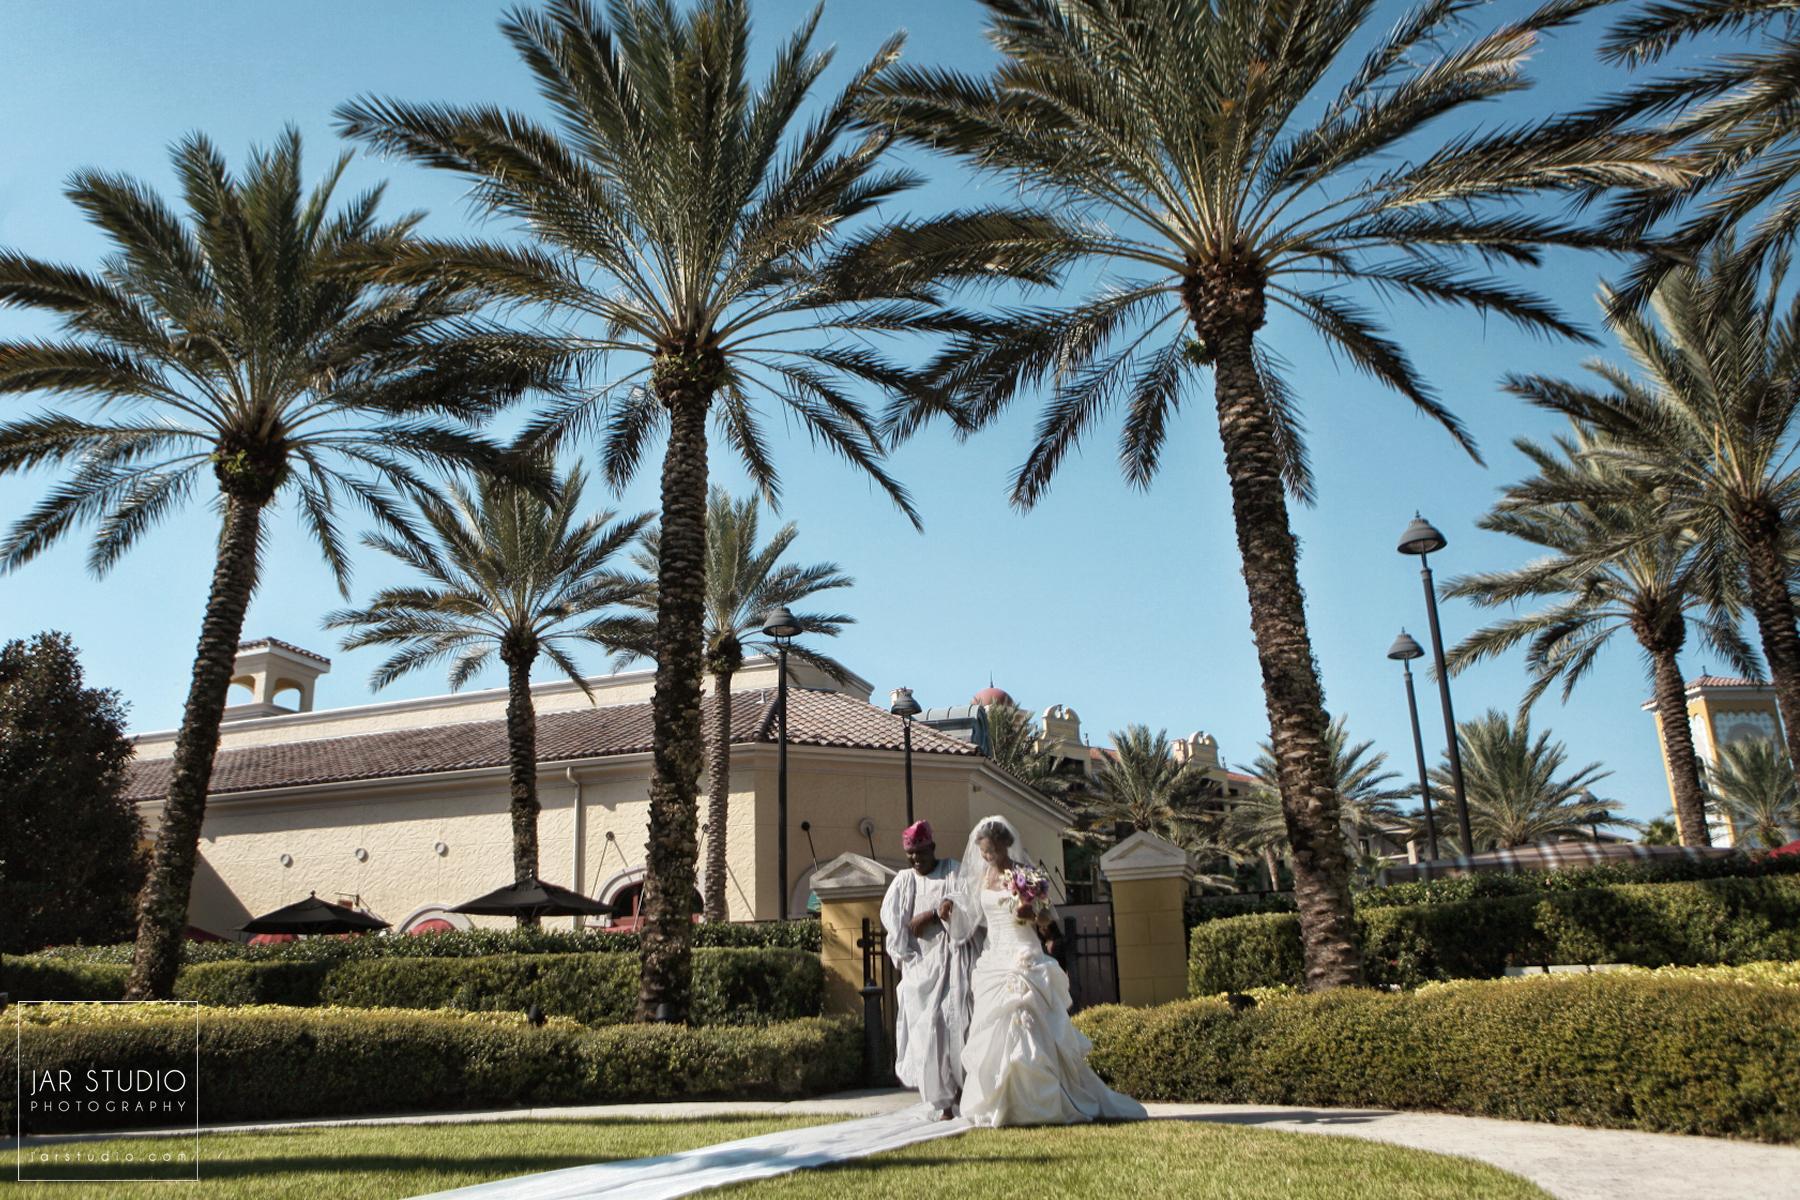 11-bride-walking-hilton-tuscany-orlando-destination-wedding-jarstudio-photography.JPG